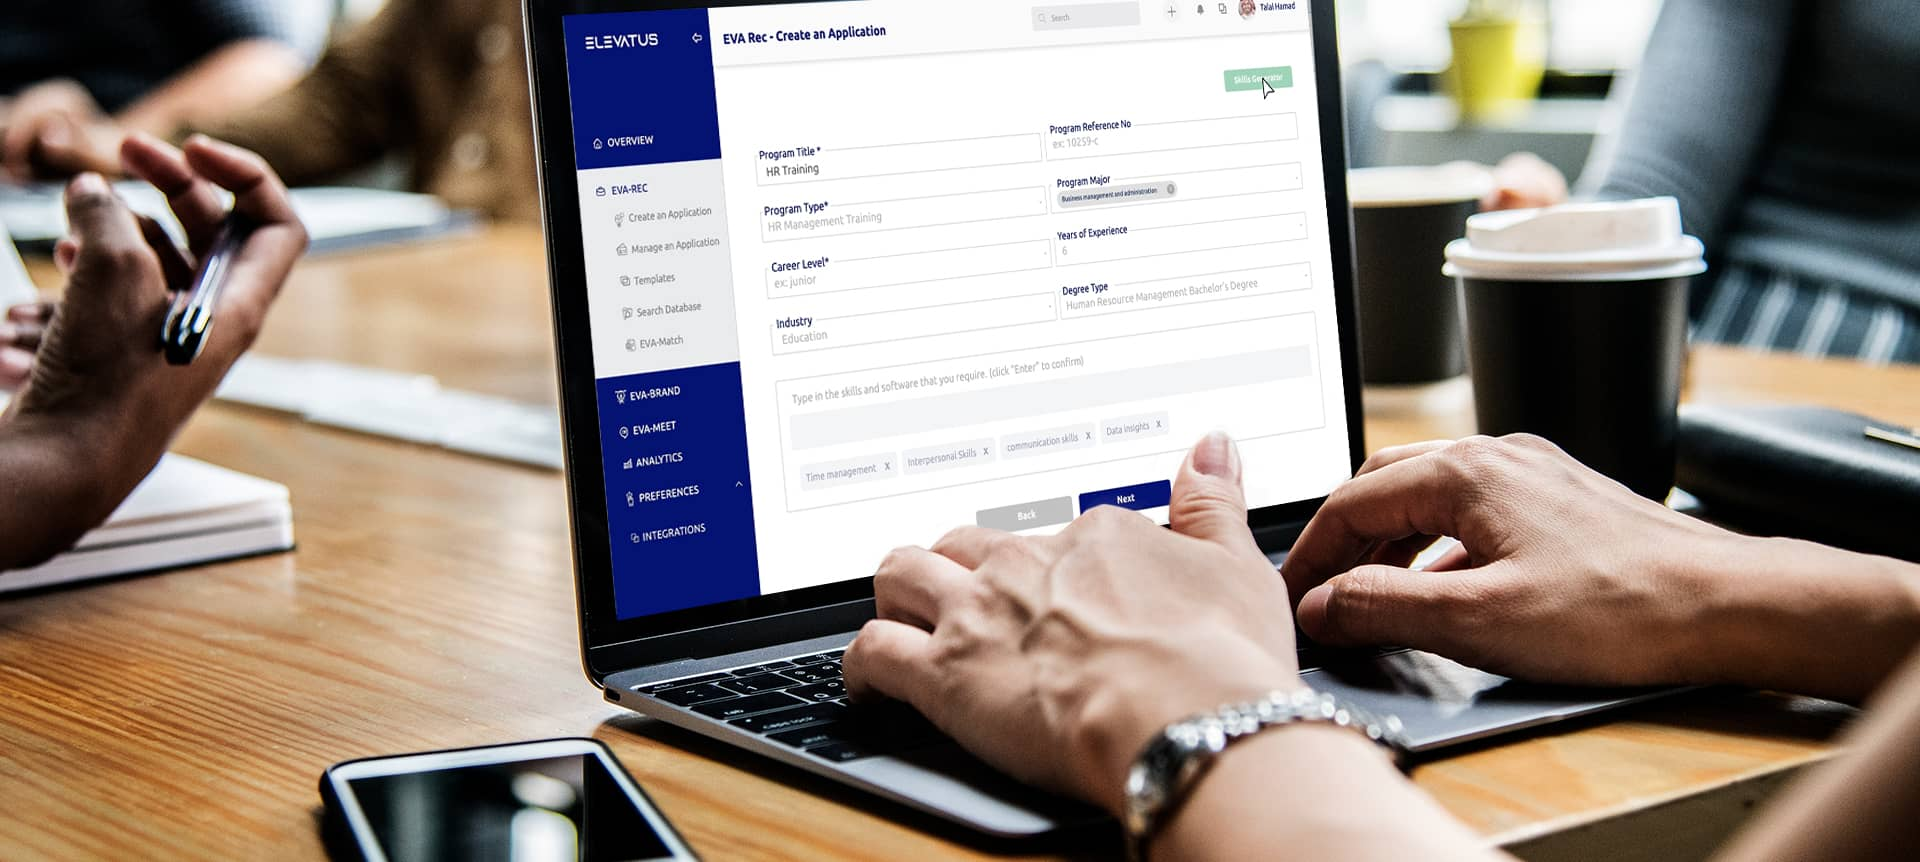 A recruiter using the hiring platform EVA-REC on the laptop